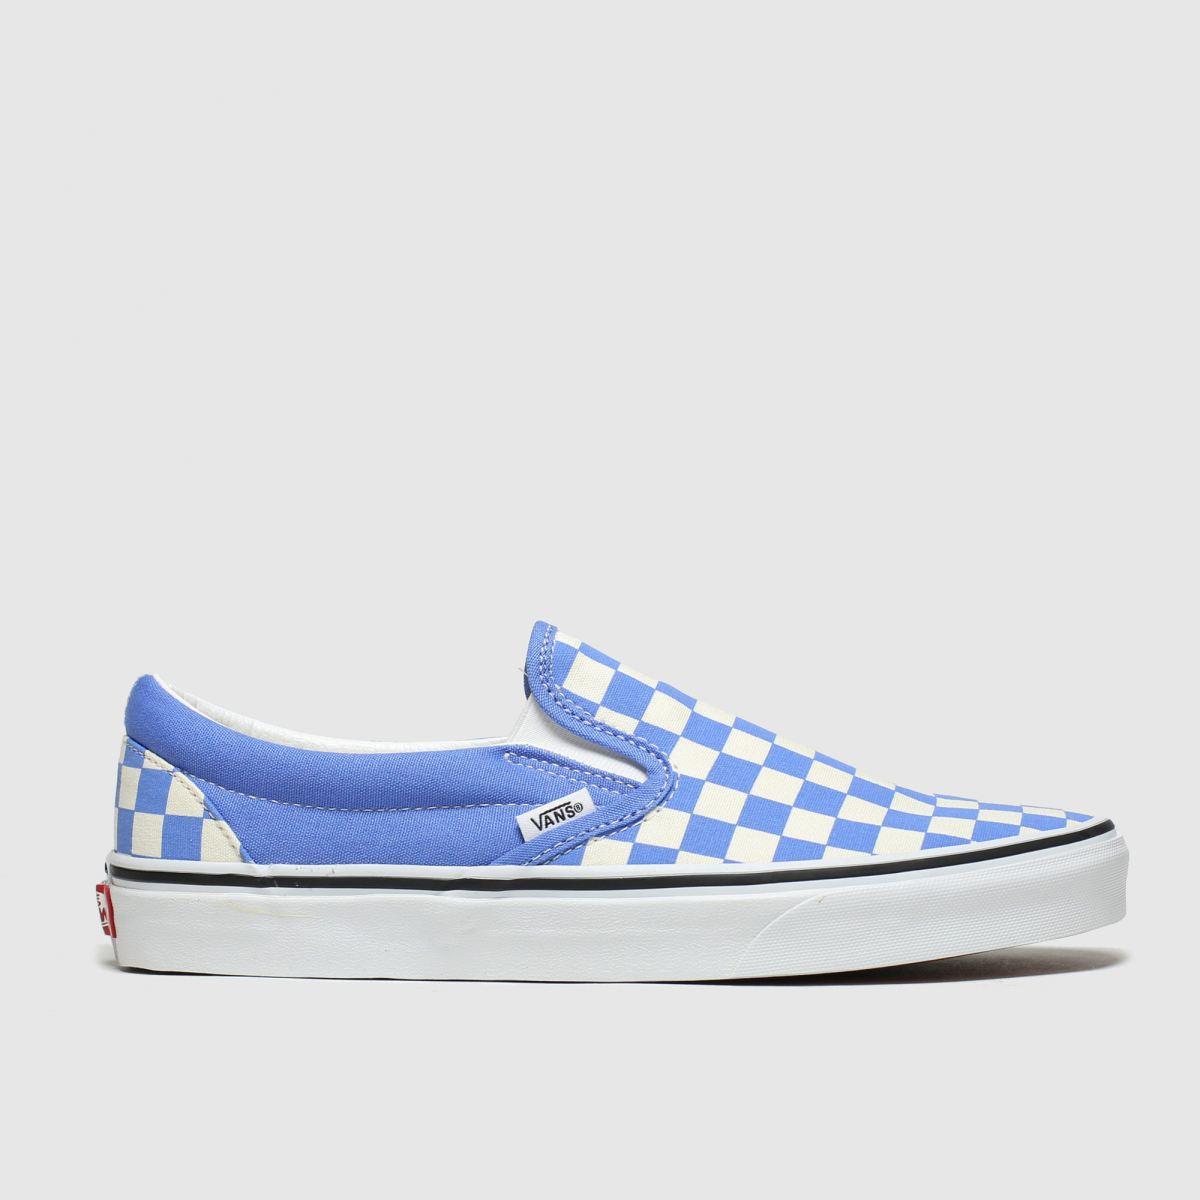 Vans White & Blue Classic Slip-on Trainers